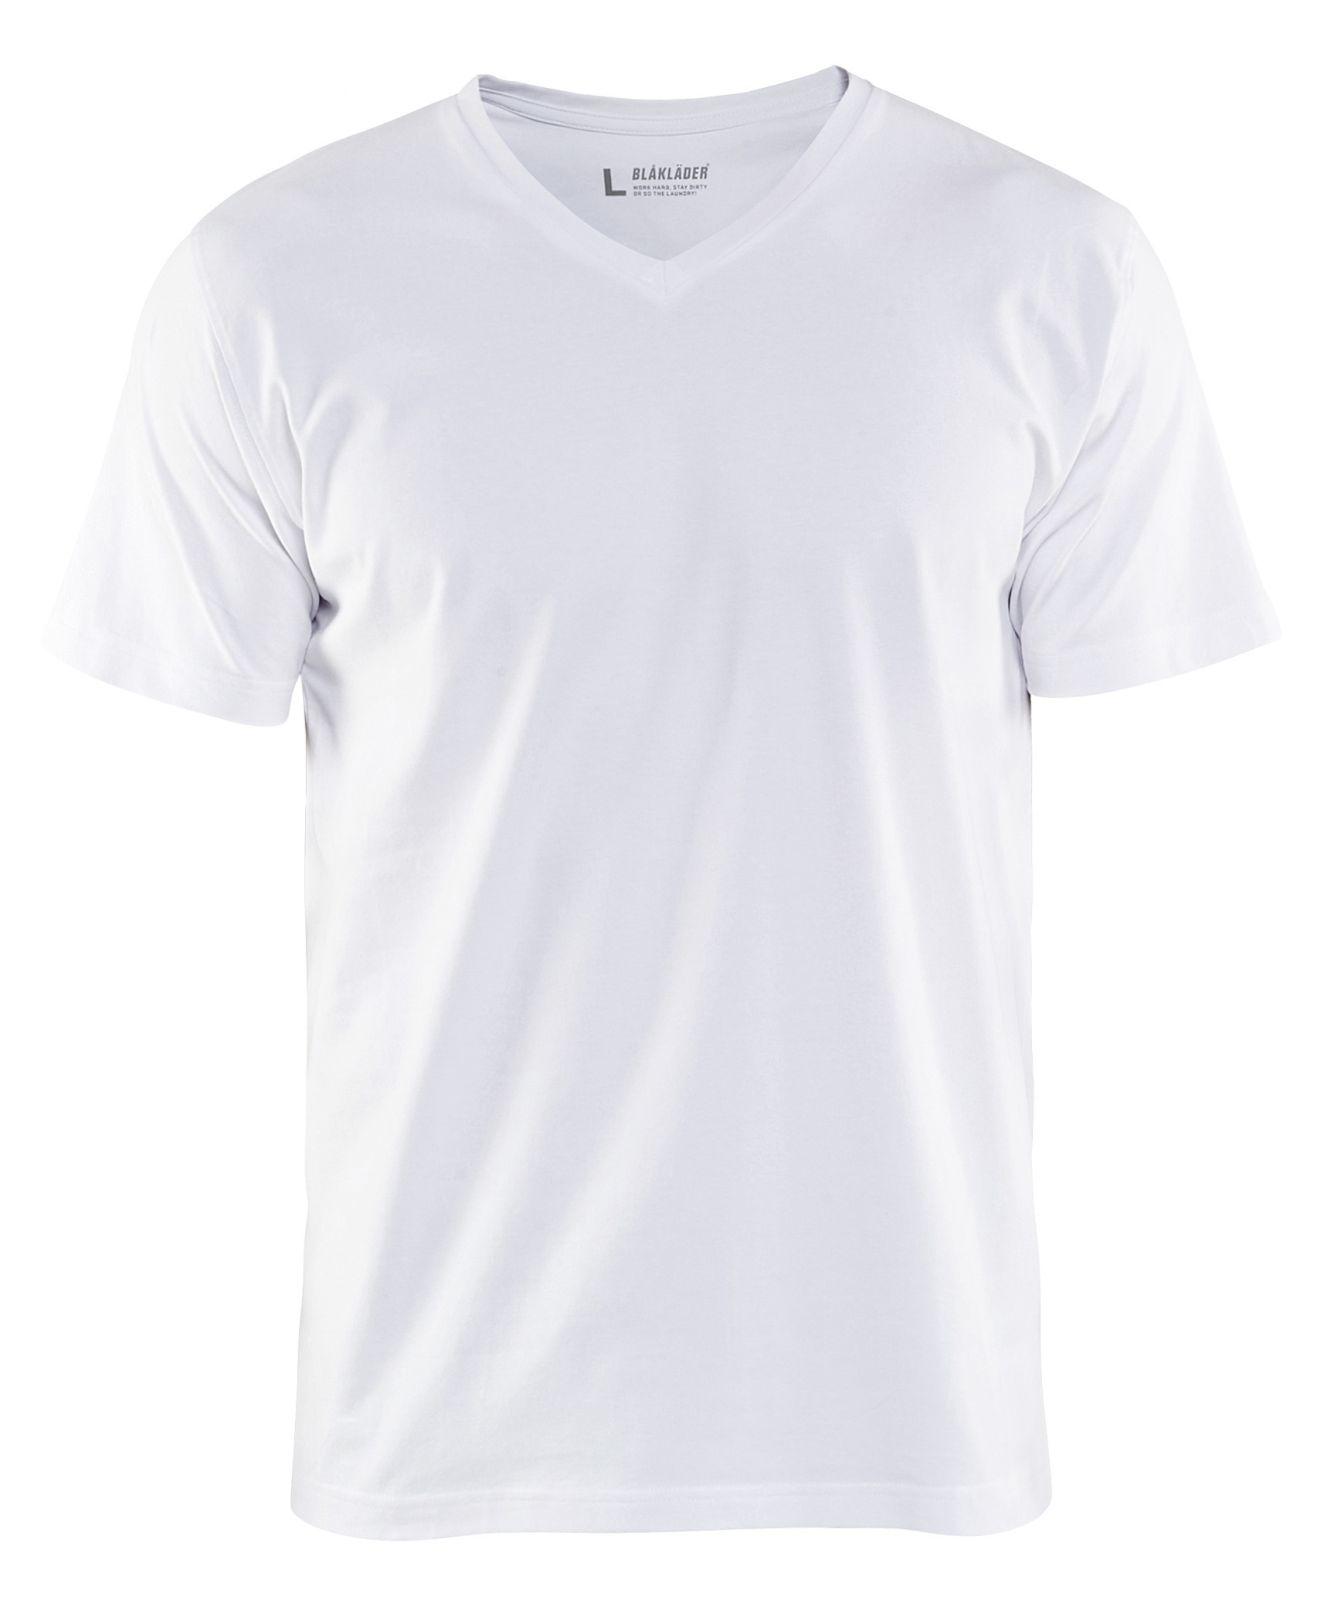 Blaklader T-shirts 33601029 wit(1000)